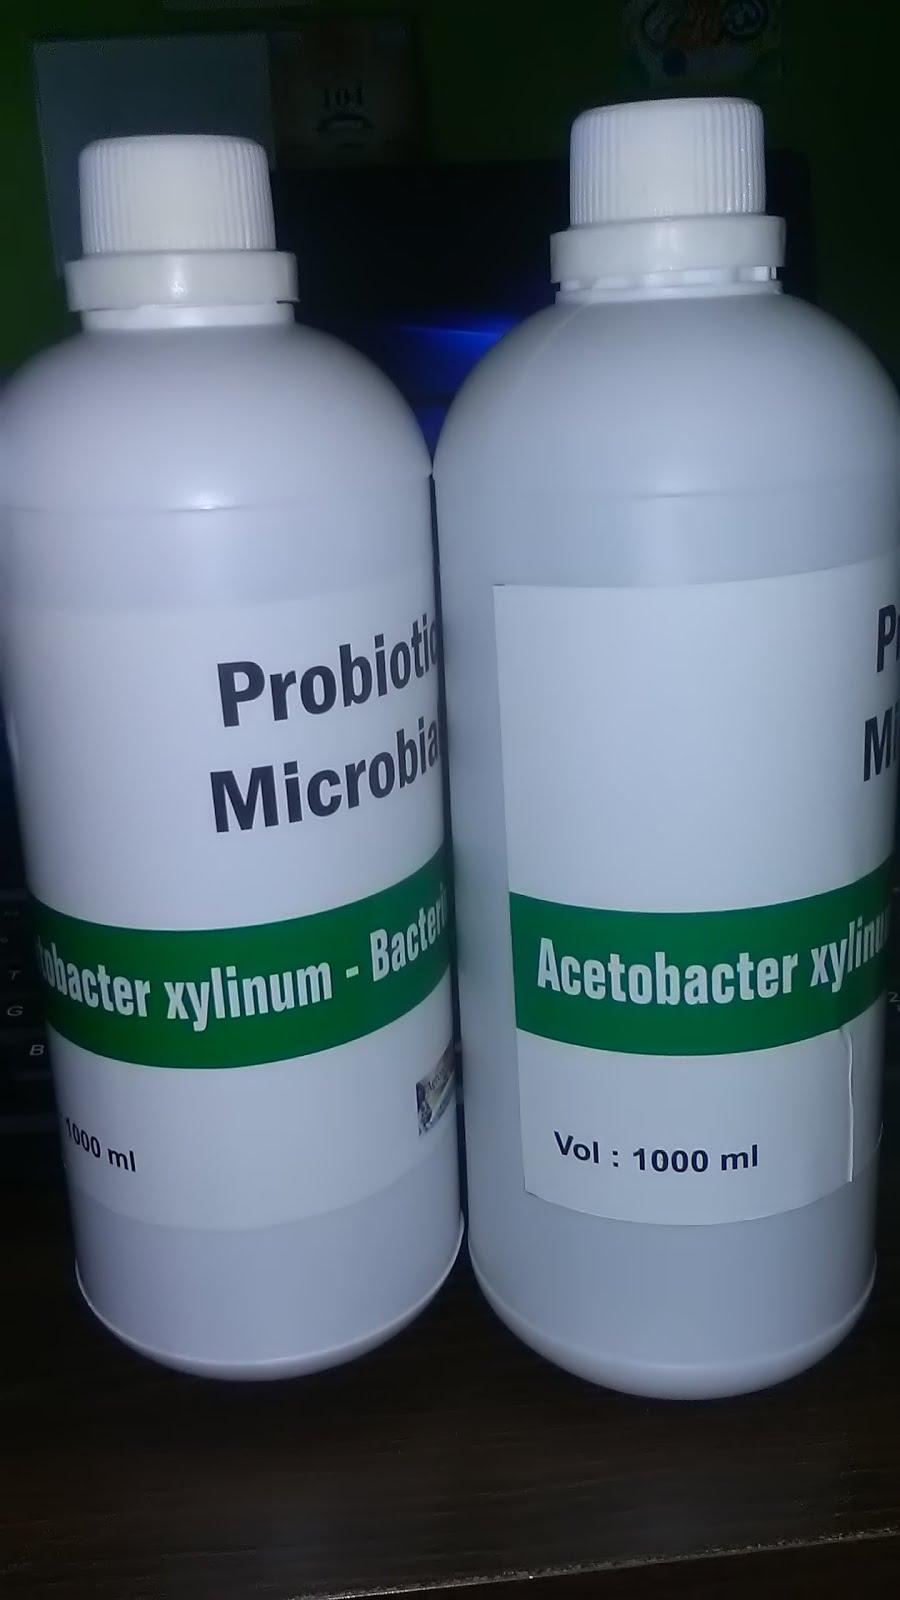 Acetobacter xylinum